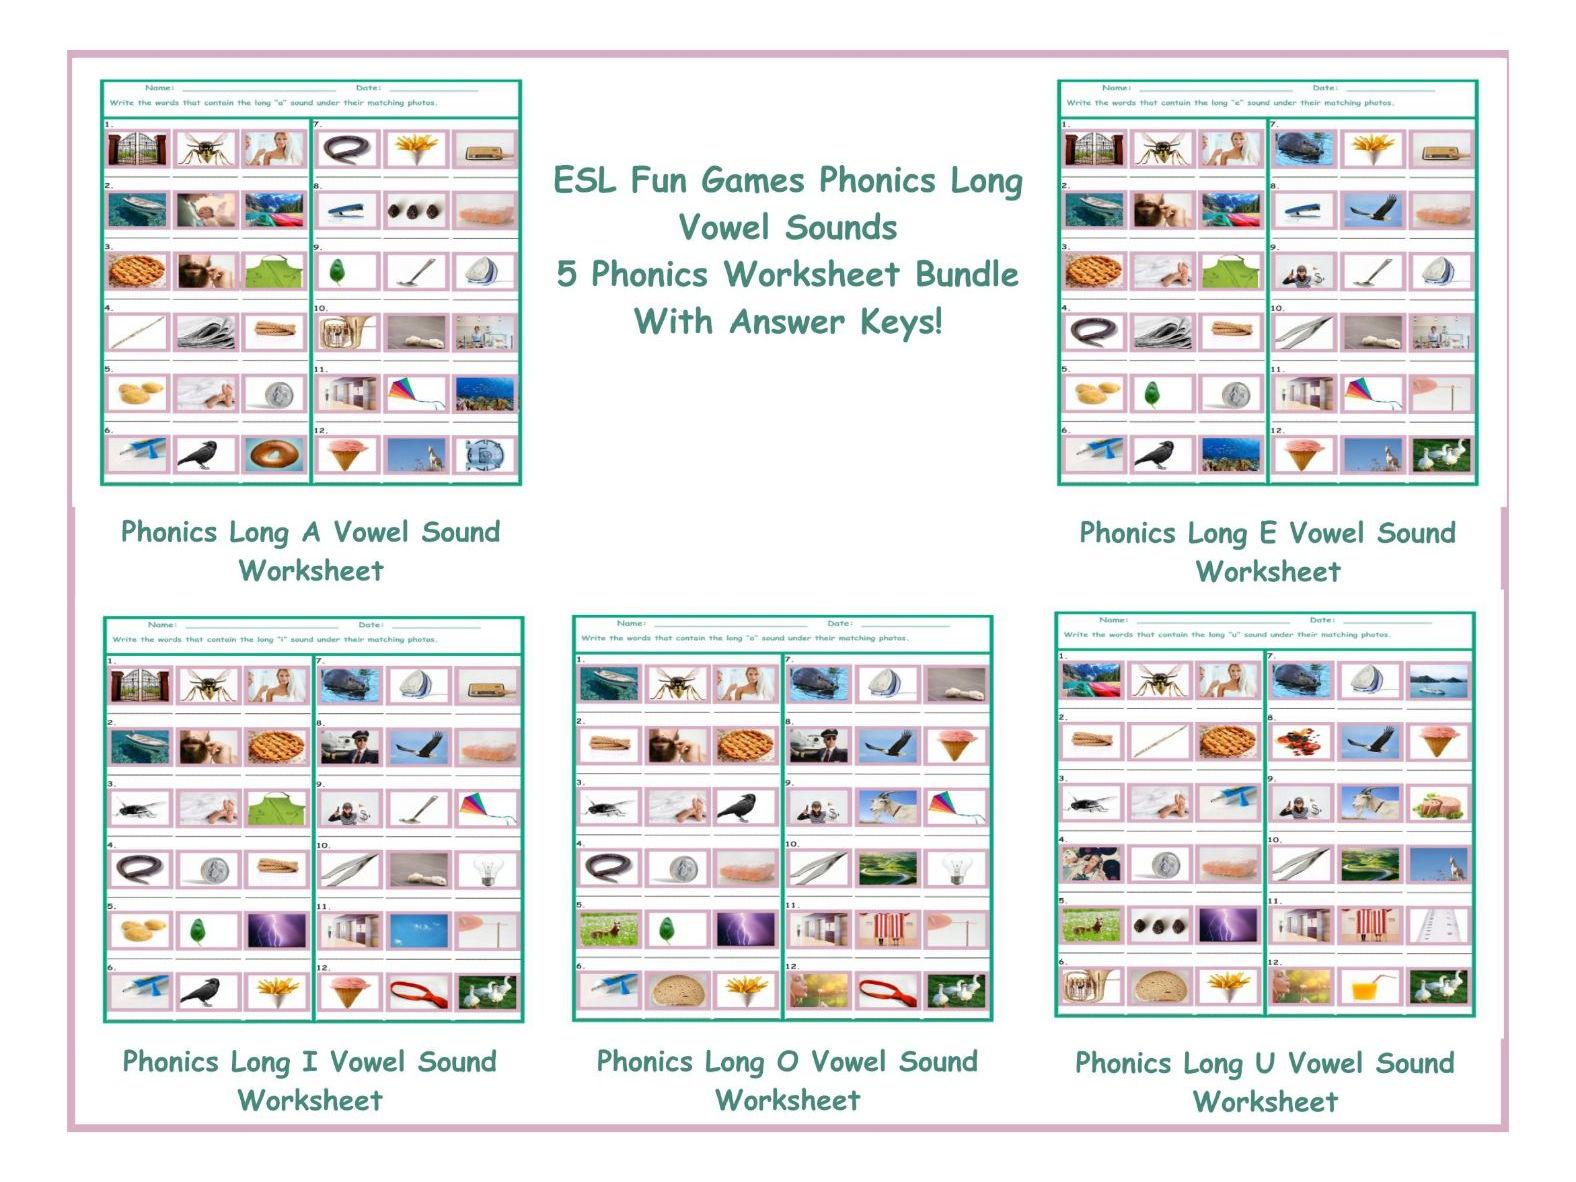 Phonics Long Vowel Sounds 5 Worksheet Bundle